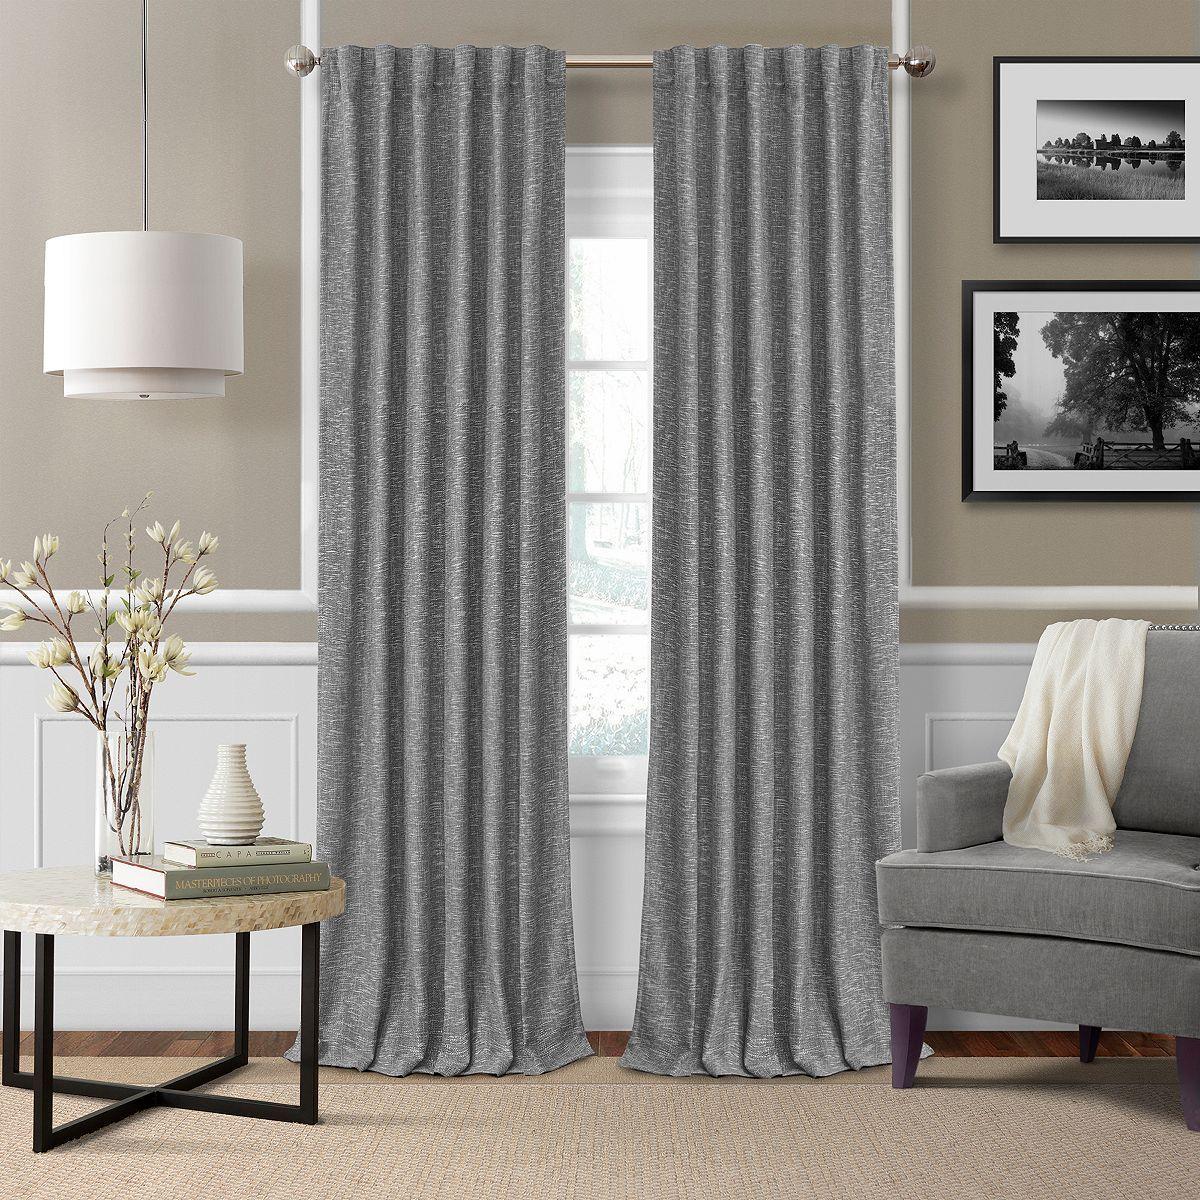 Elrene Home Fashions Colton Textured Blackout Curtain Collection In 2020 Elrene Home Fashions Grey Curtains Living Room Living Room Drapes